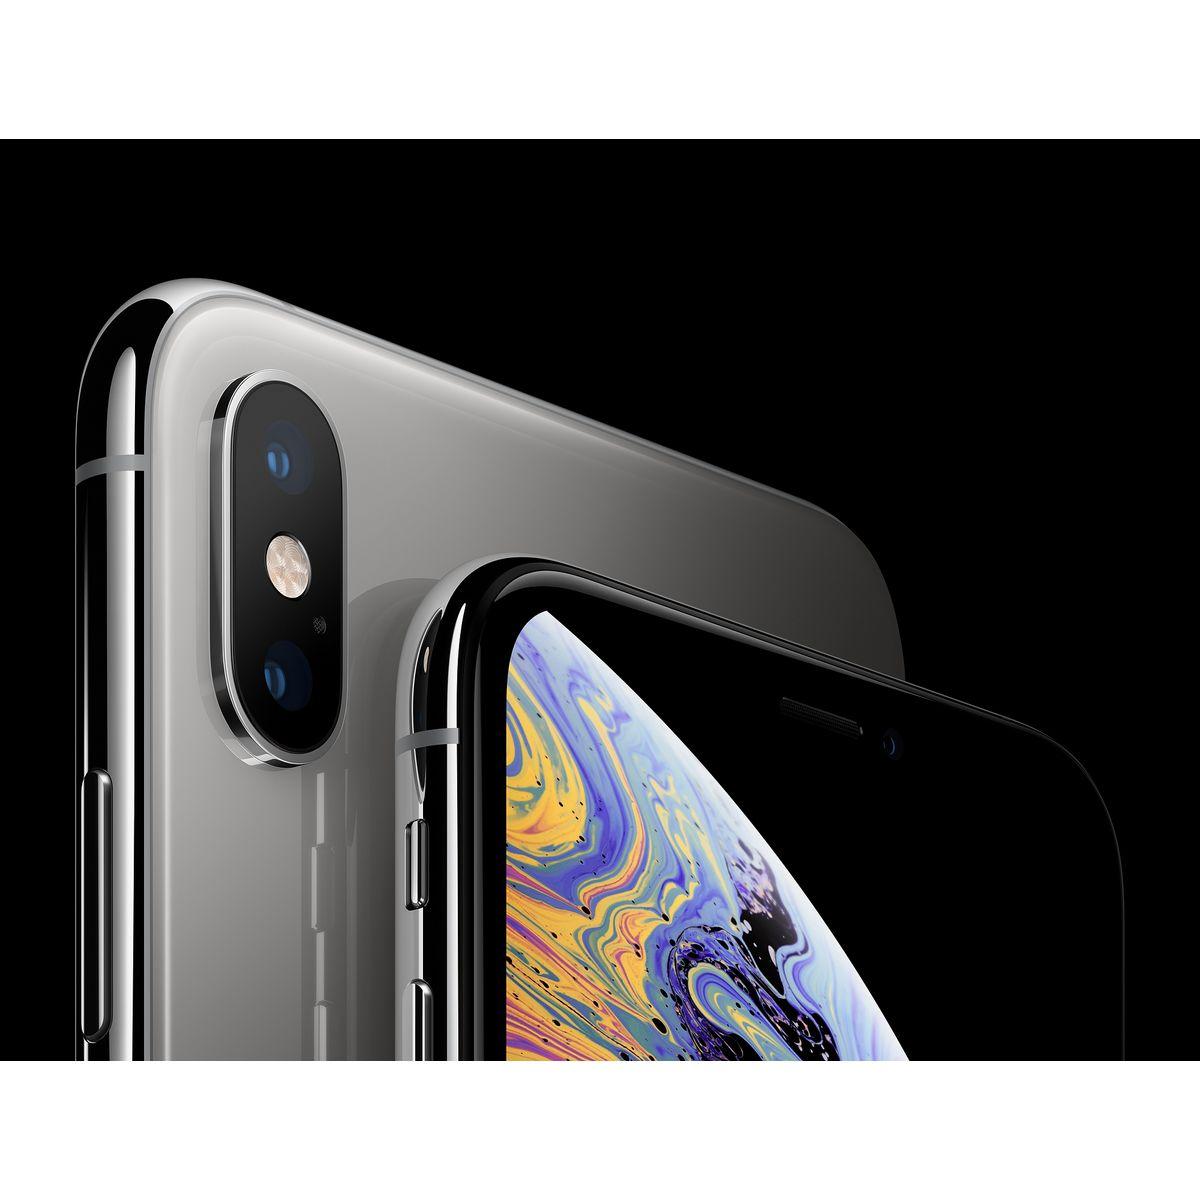 APPLE Smartphone - iPhone XS Max - 64 Go - 6.5 pouces - Argent